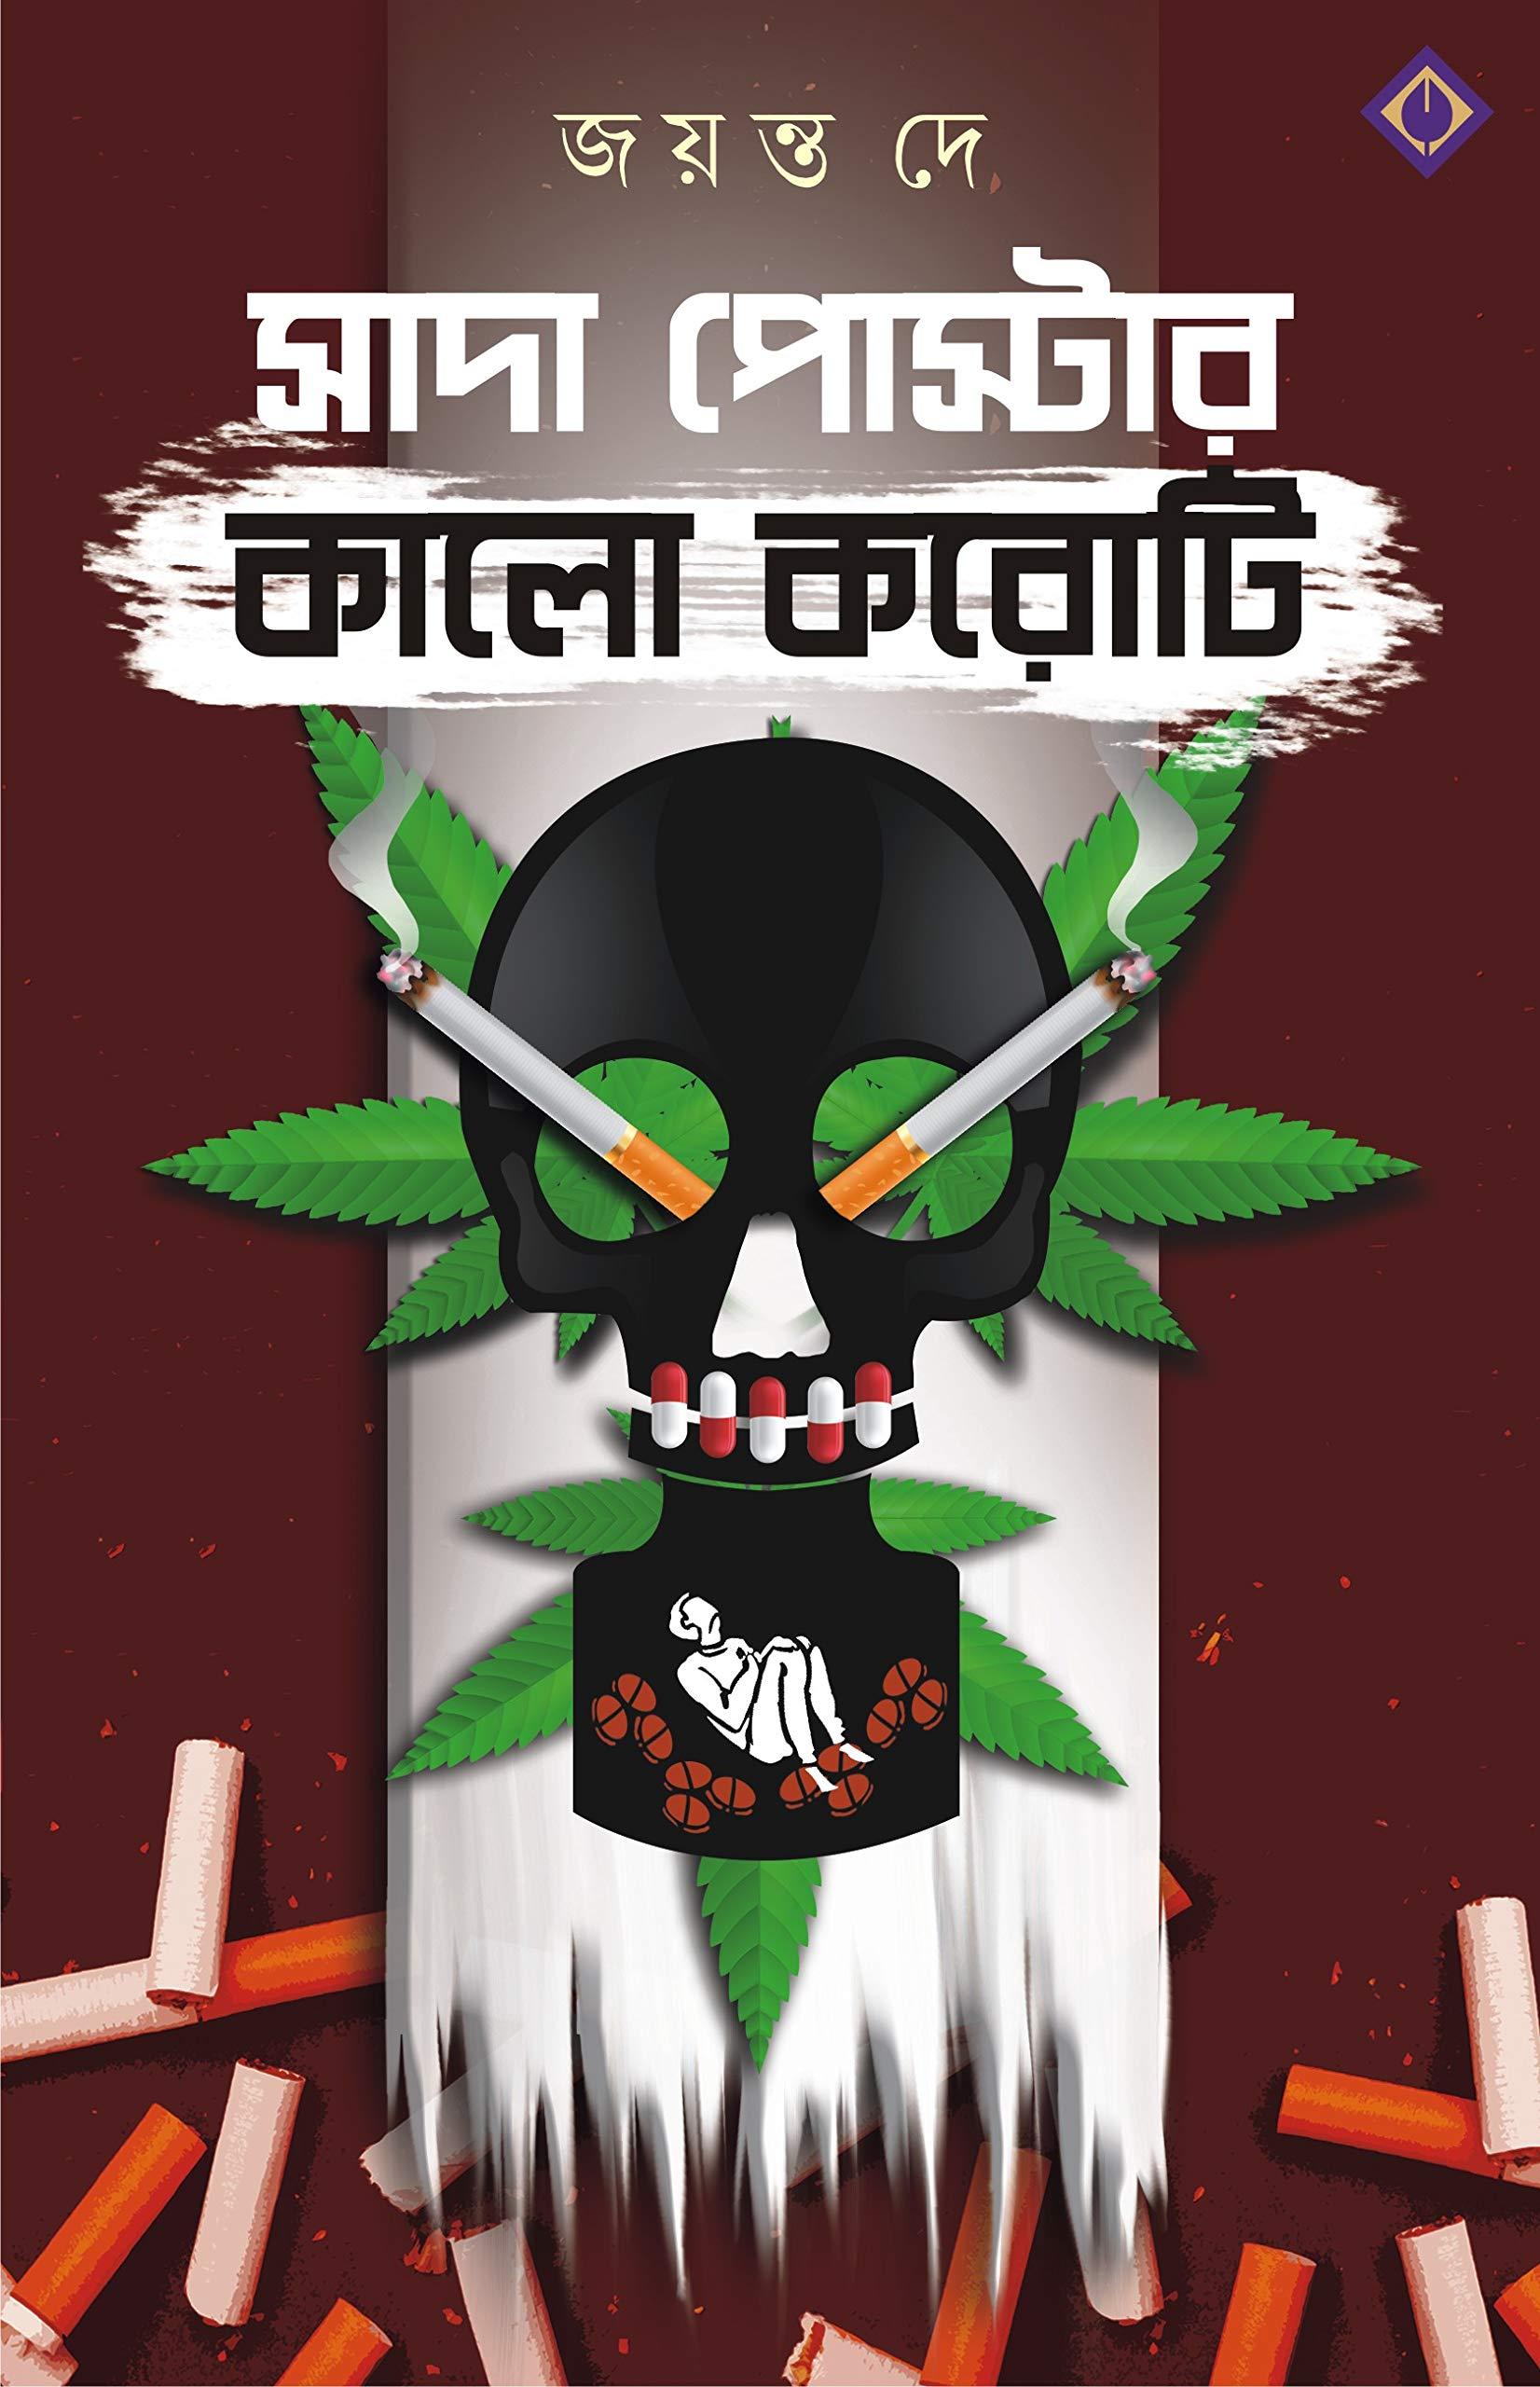 SADA POSTER KALO KOROTI   Bengali Book for Adults   Bangla Upanyas   Bengali Thriller About Drugs [Hardcover] JAYANTA DEY